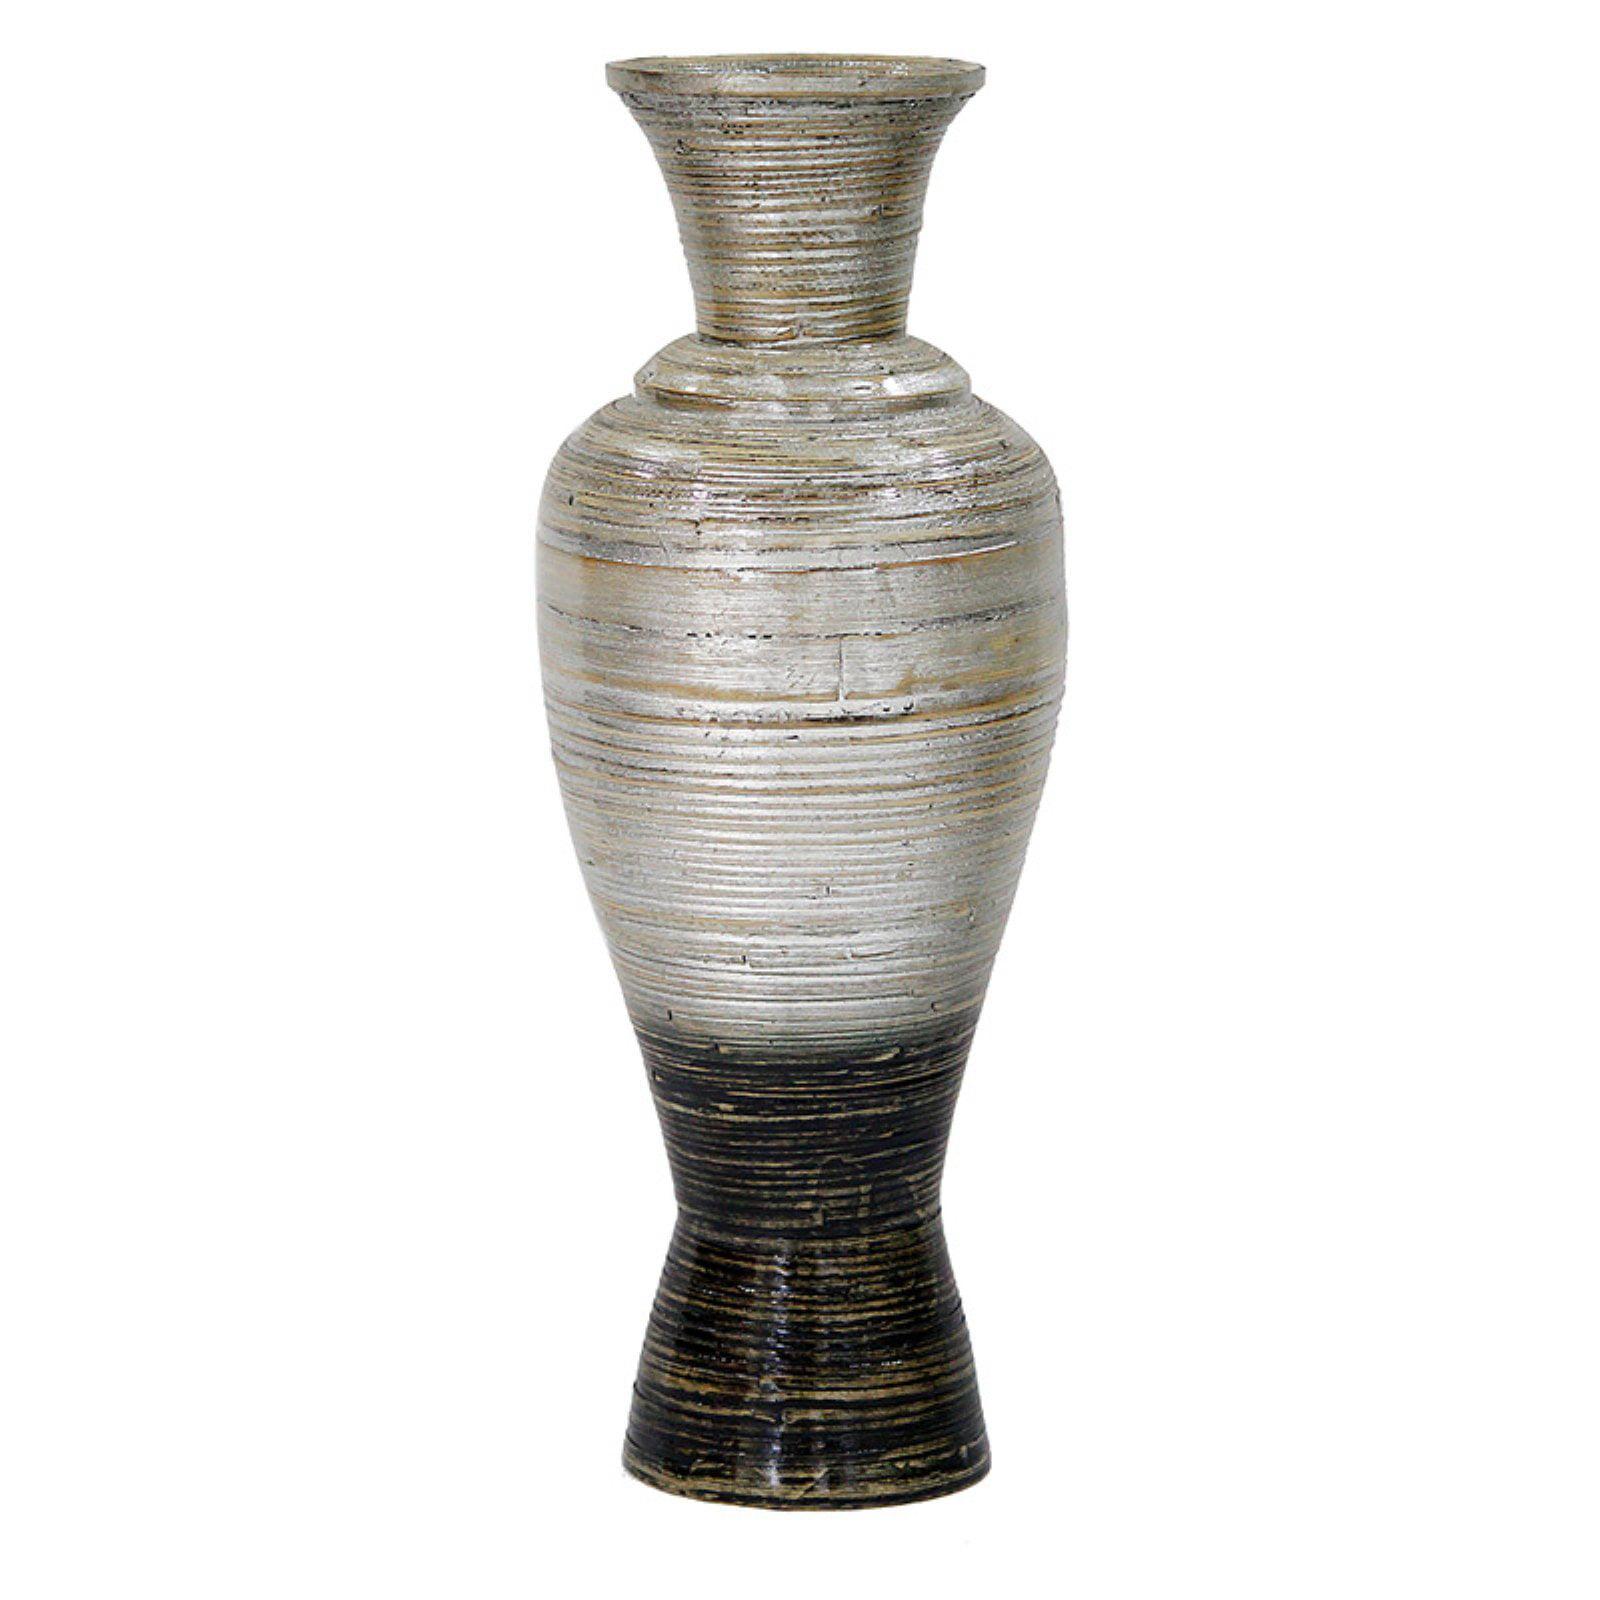 Heather Ann Large Spun Bamboo Decanter Vase